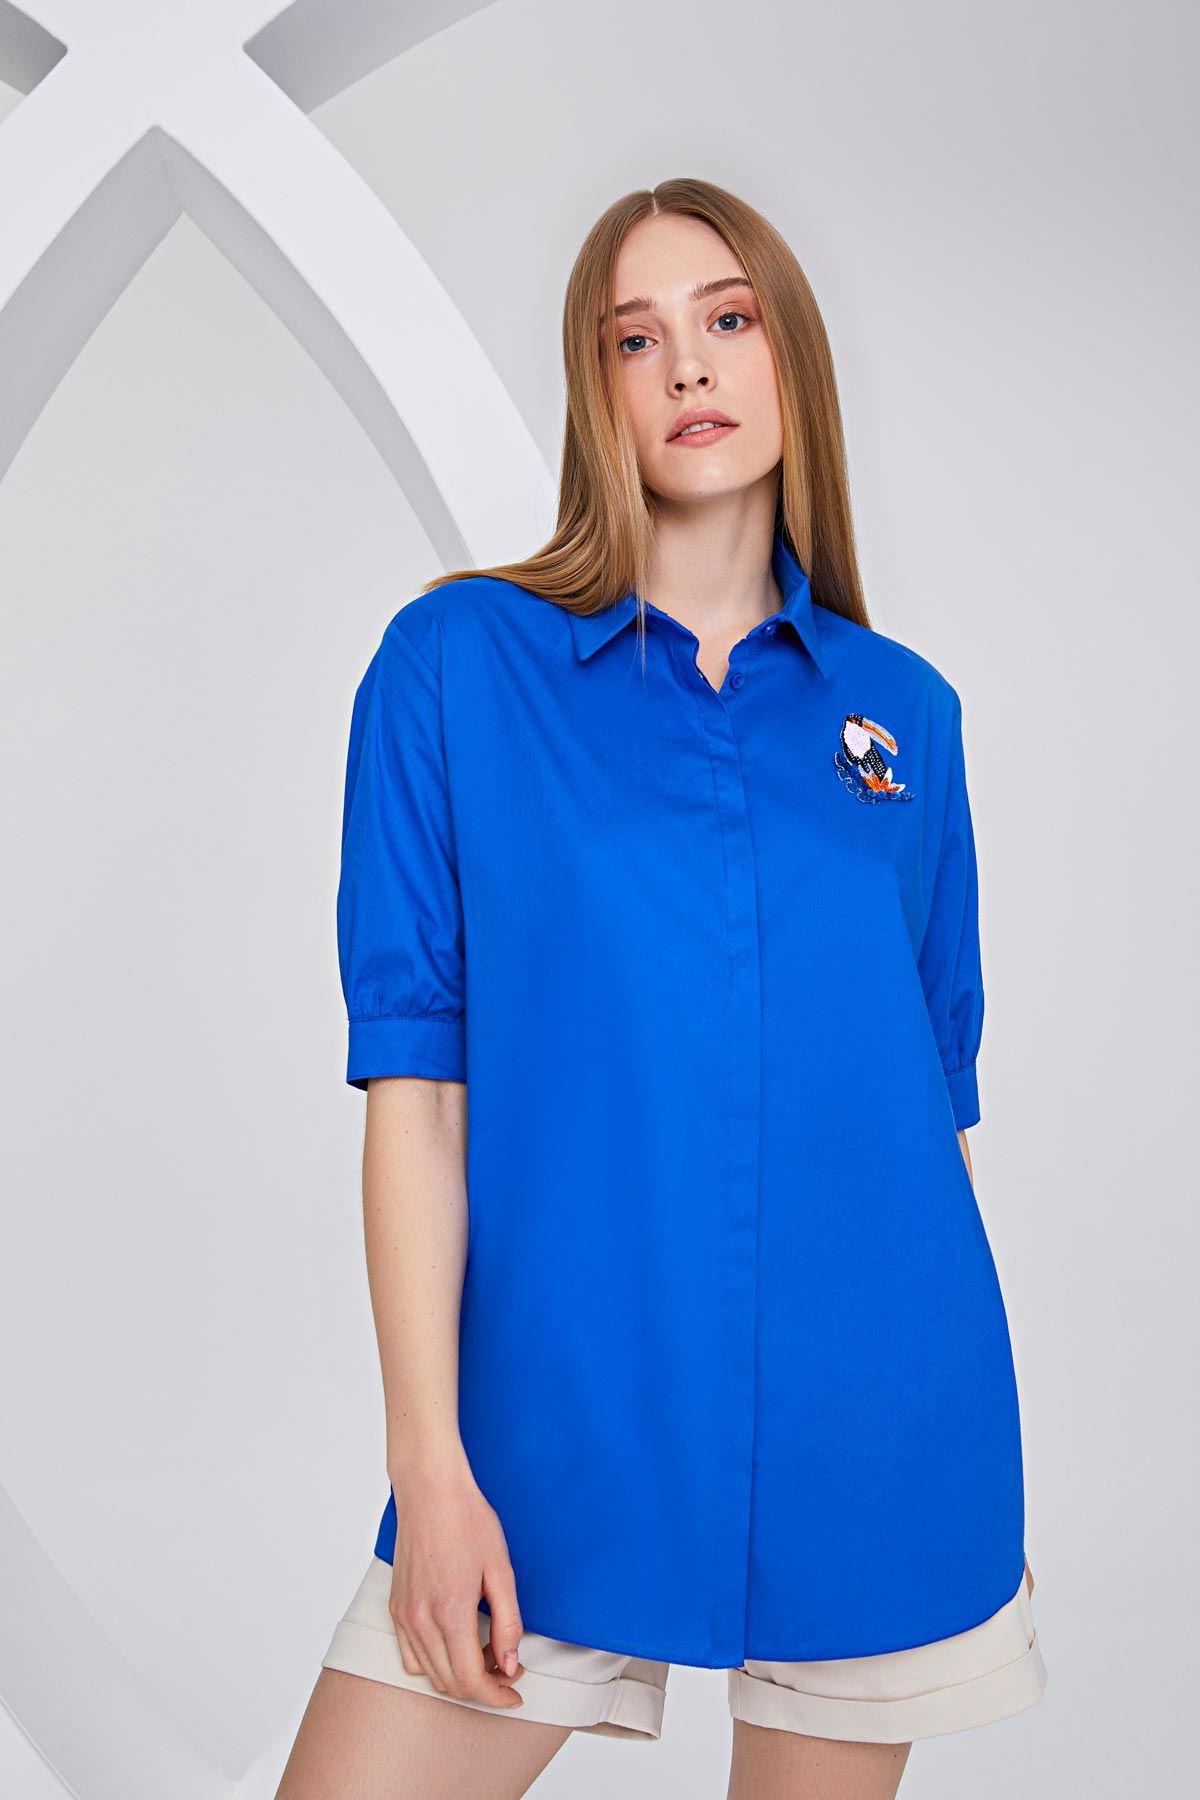 Papağan broşlu gömlek Mavi